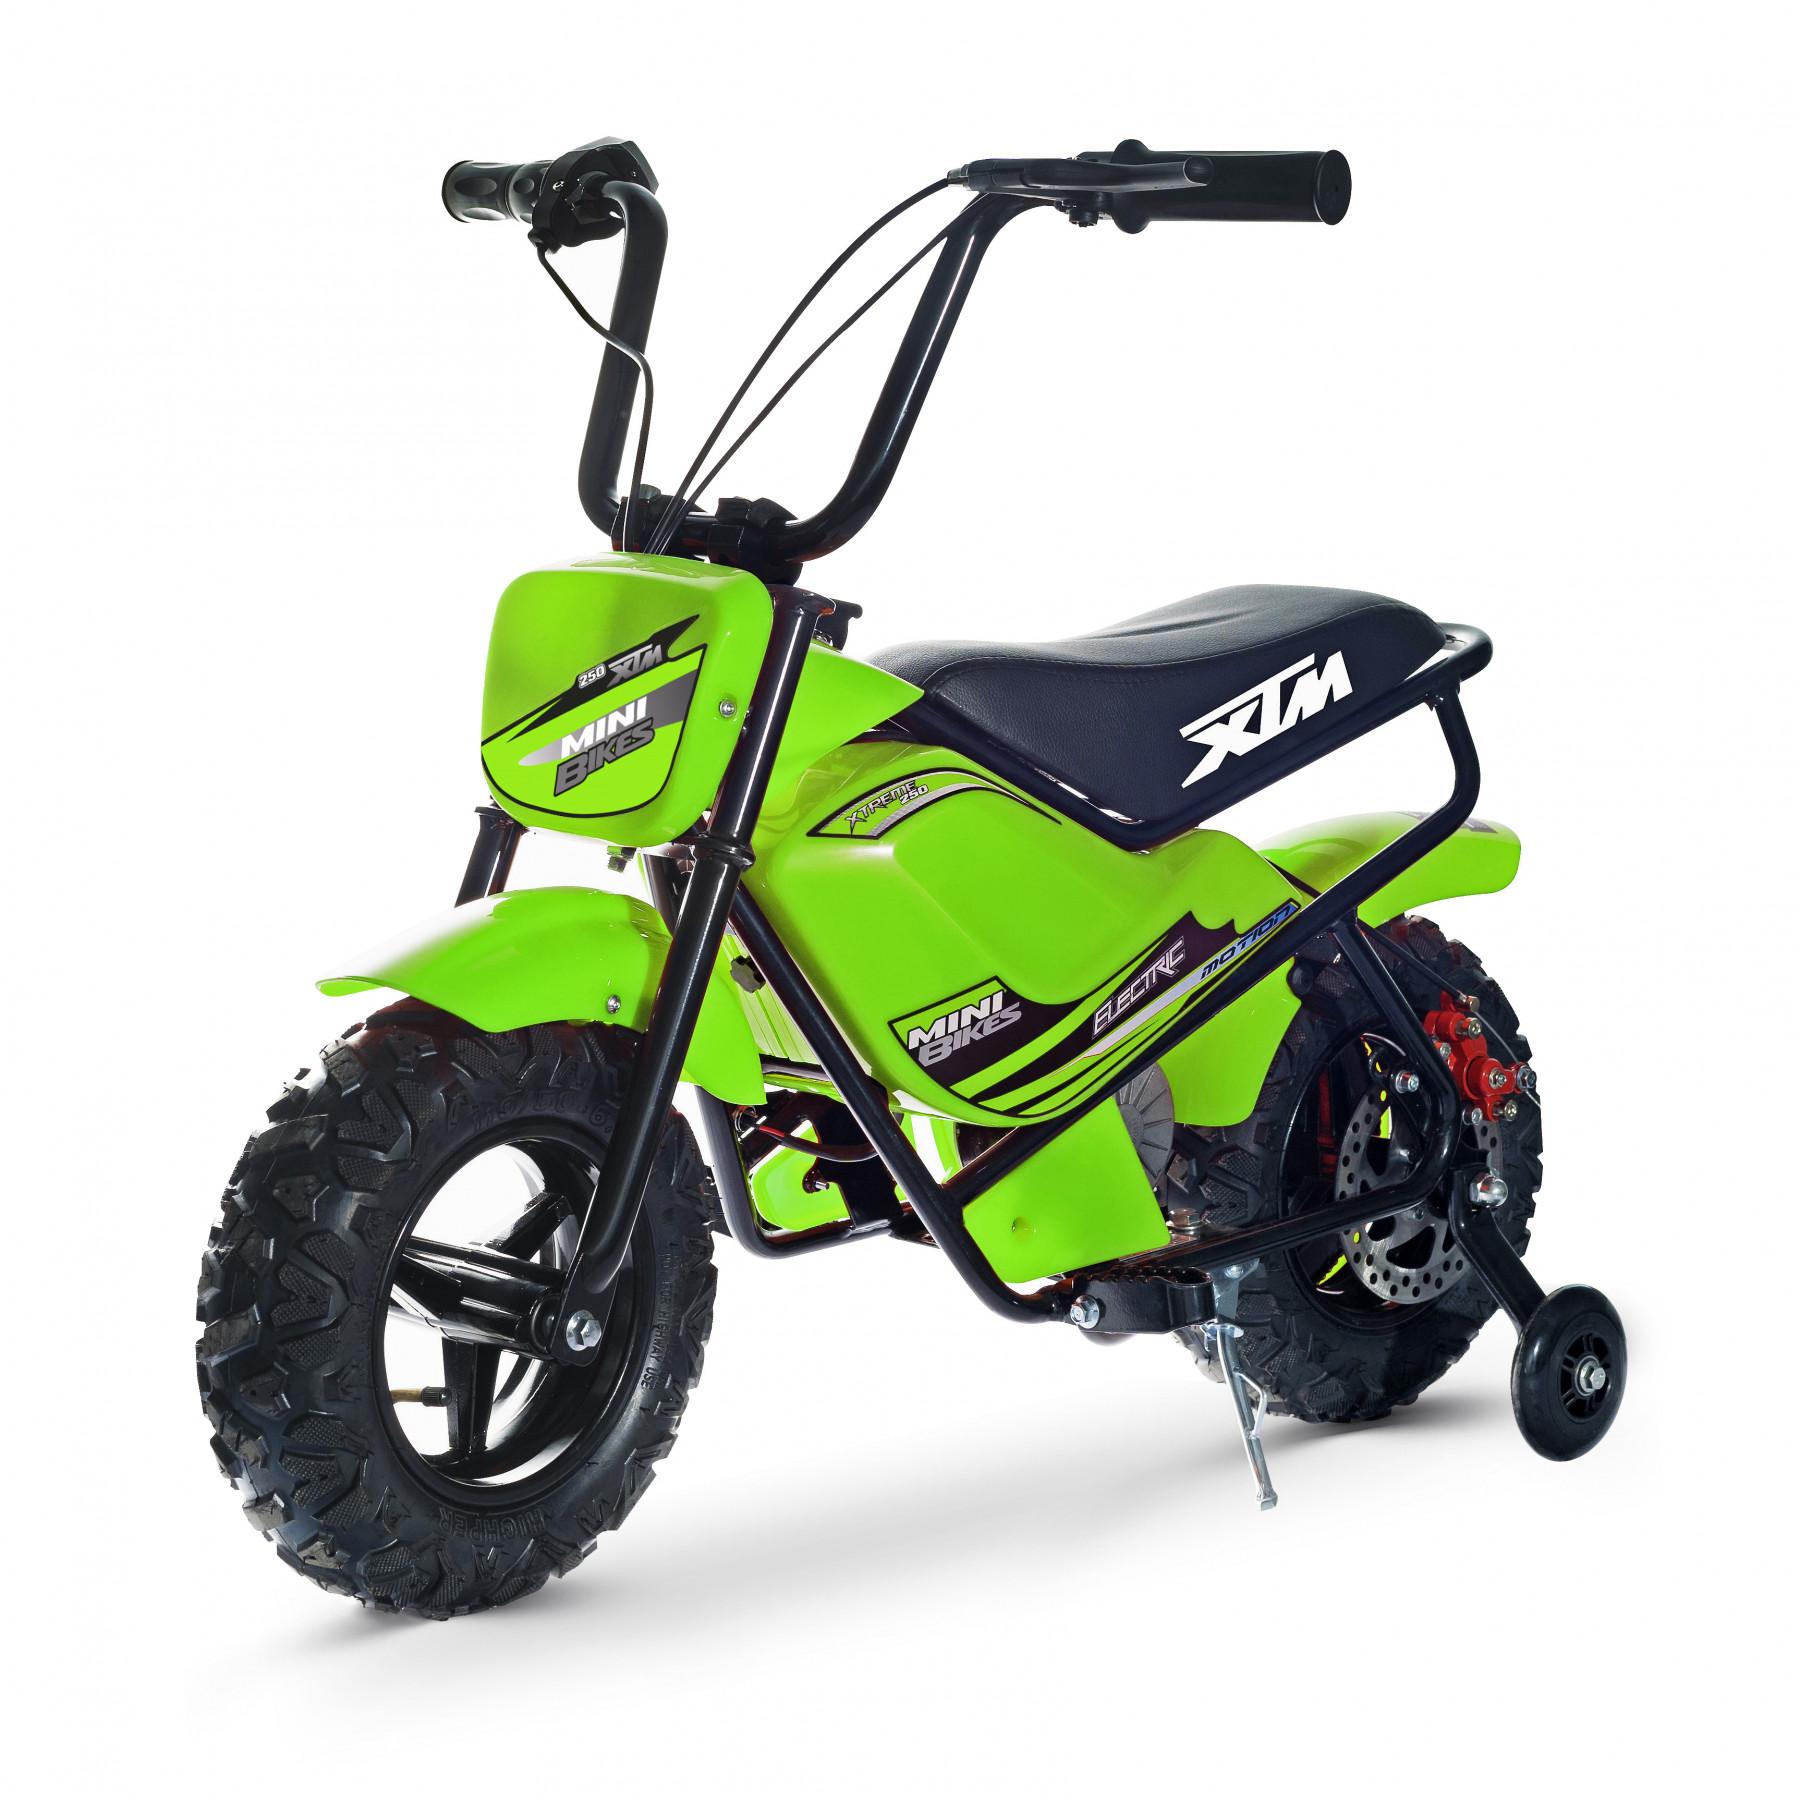 XTREME XTM MINIBIKE 24V 250W GREEN